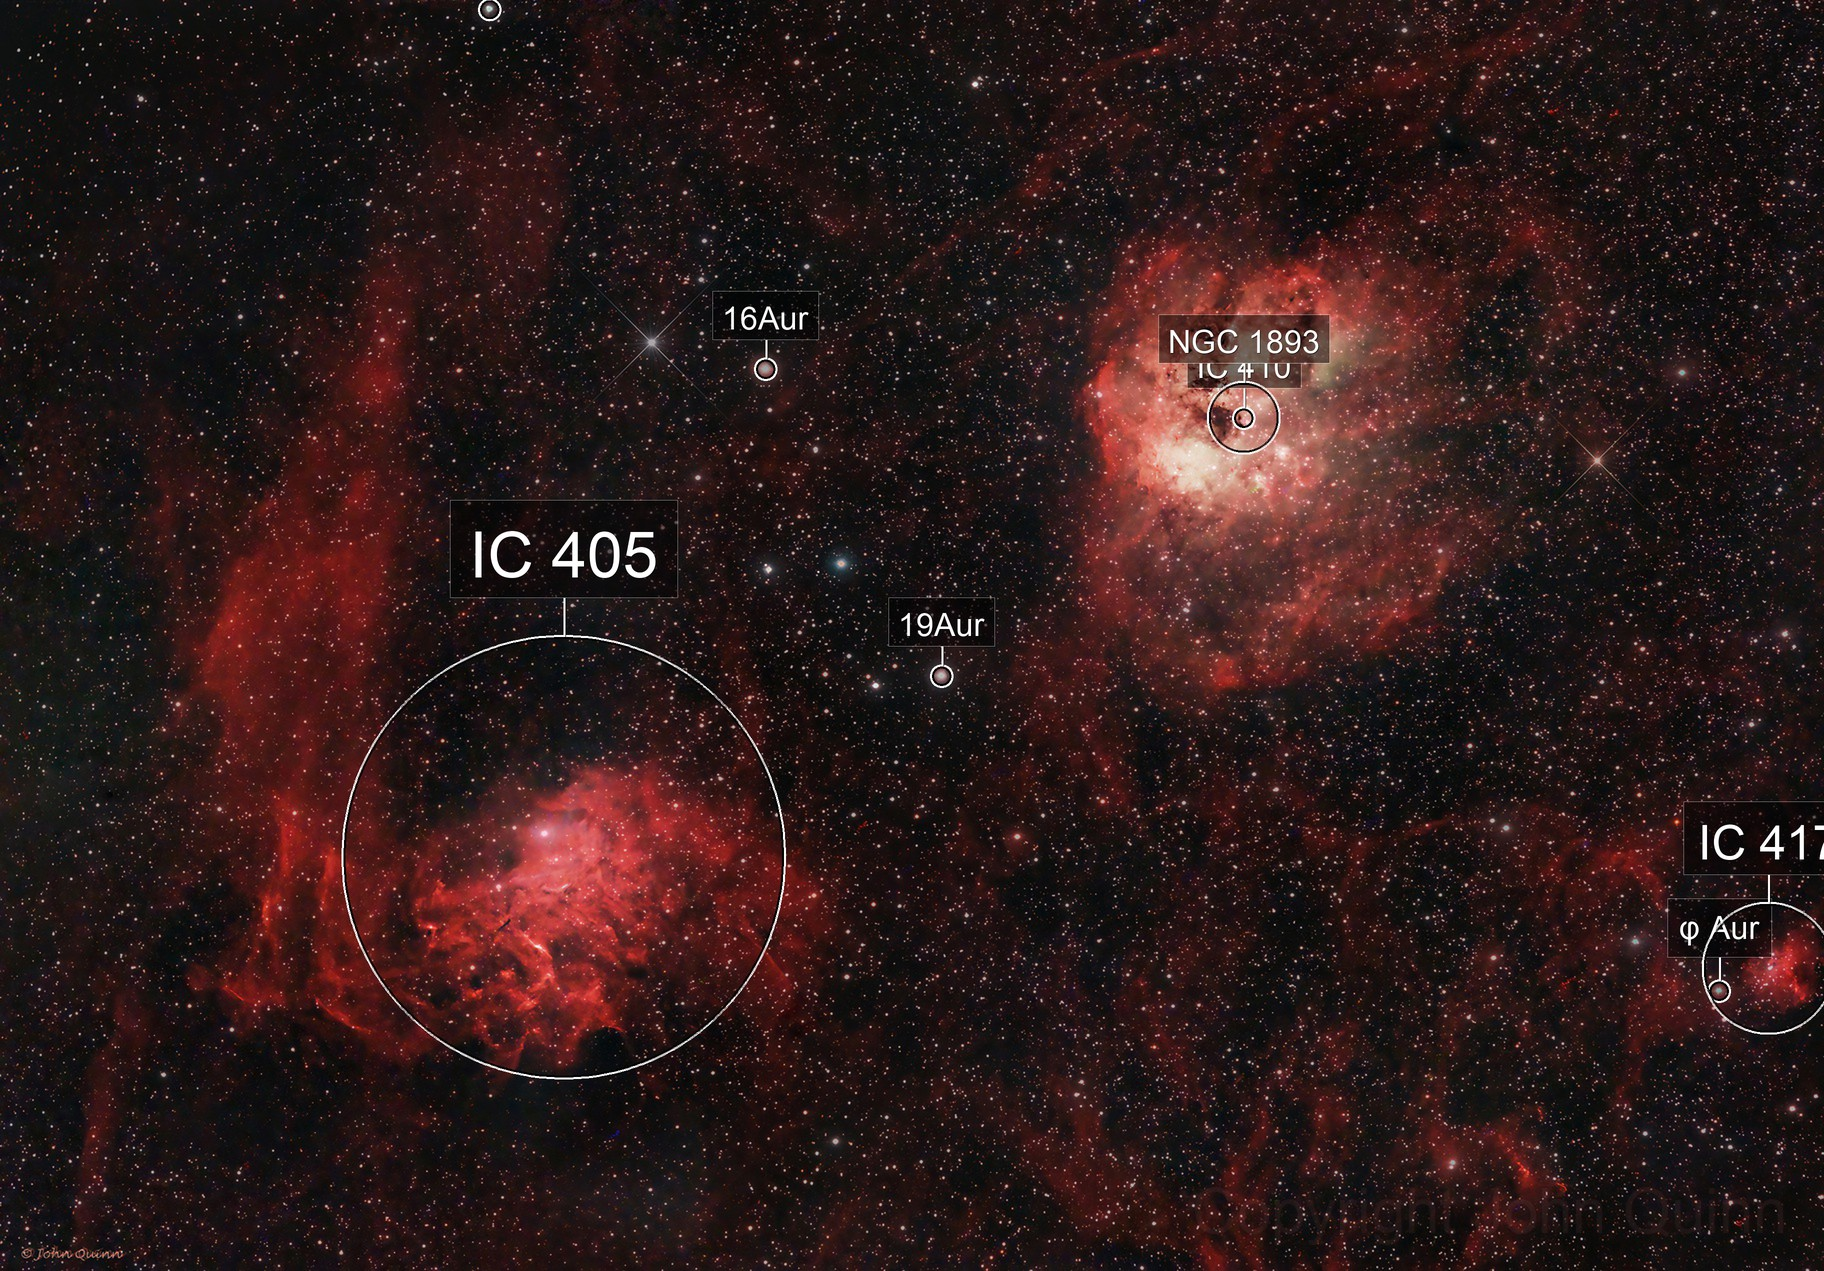 IC 410 IC 405 Tadpole and Flaming Star nebulae